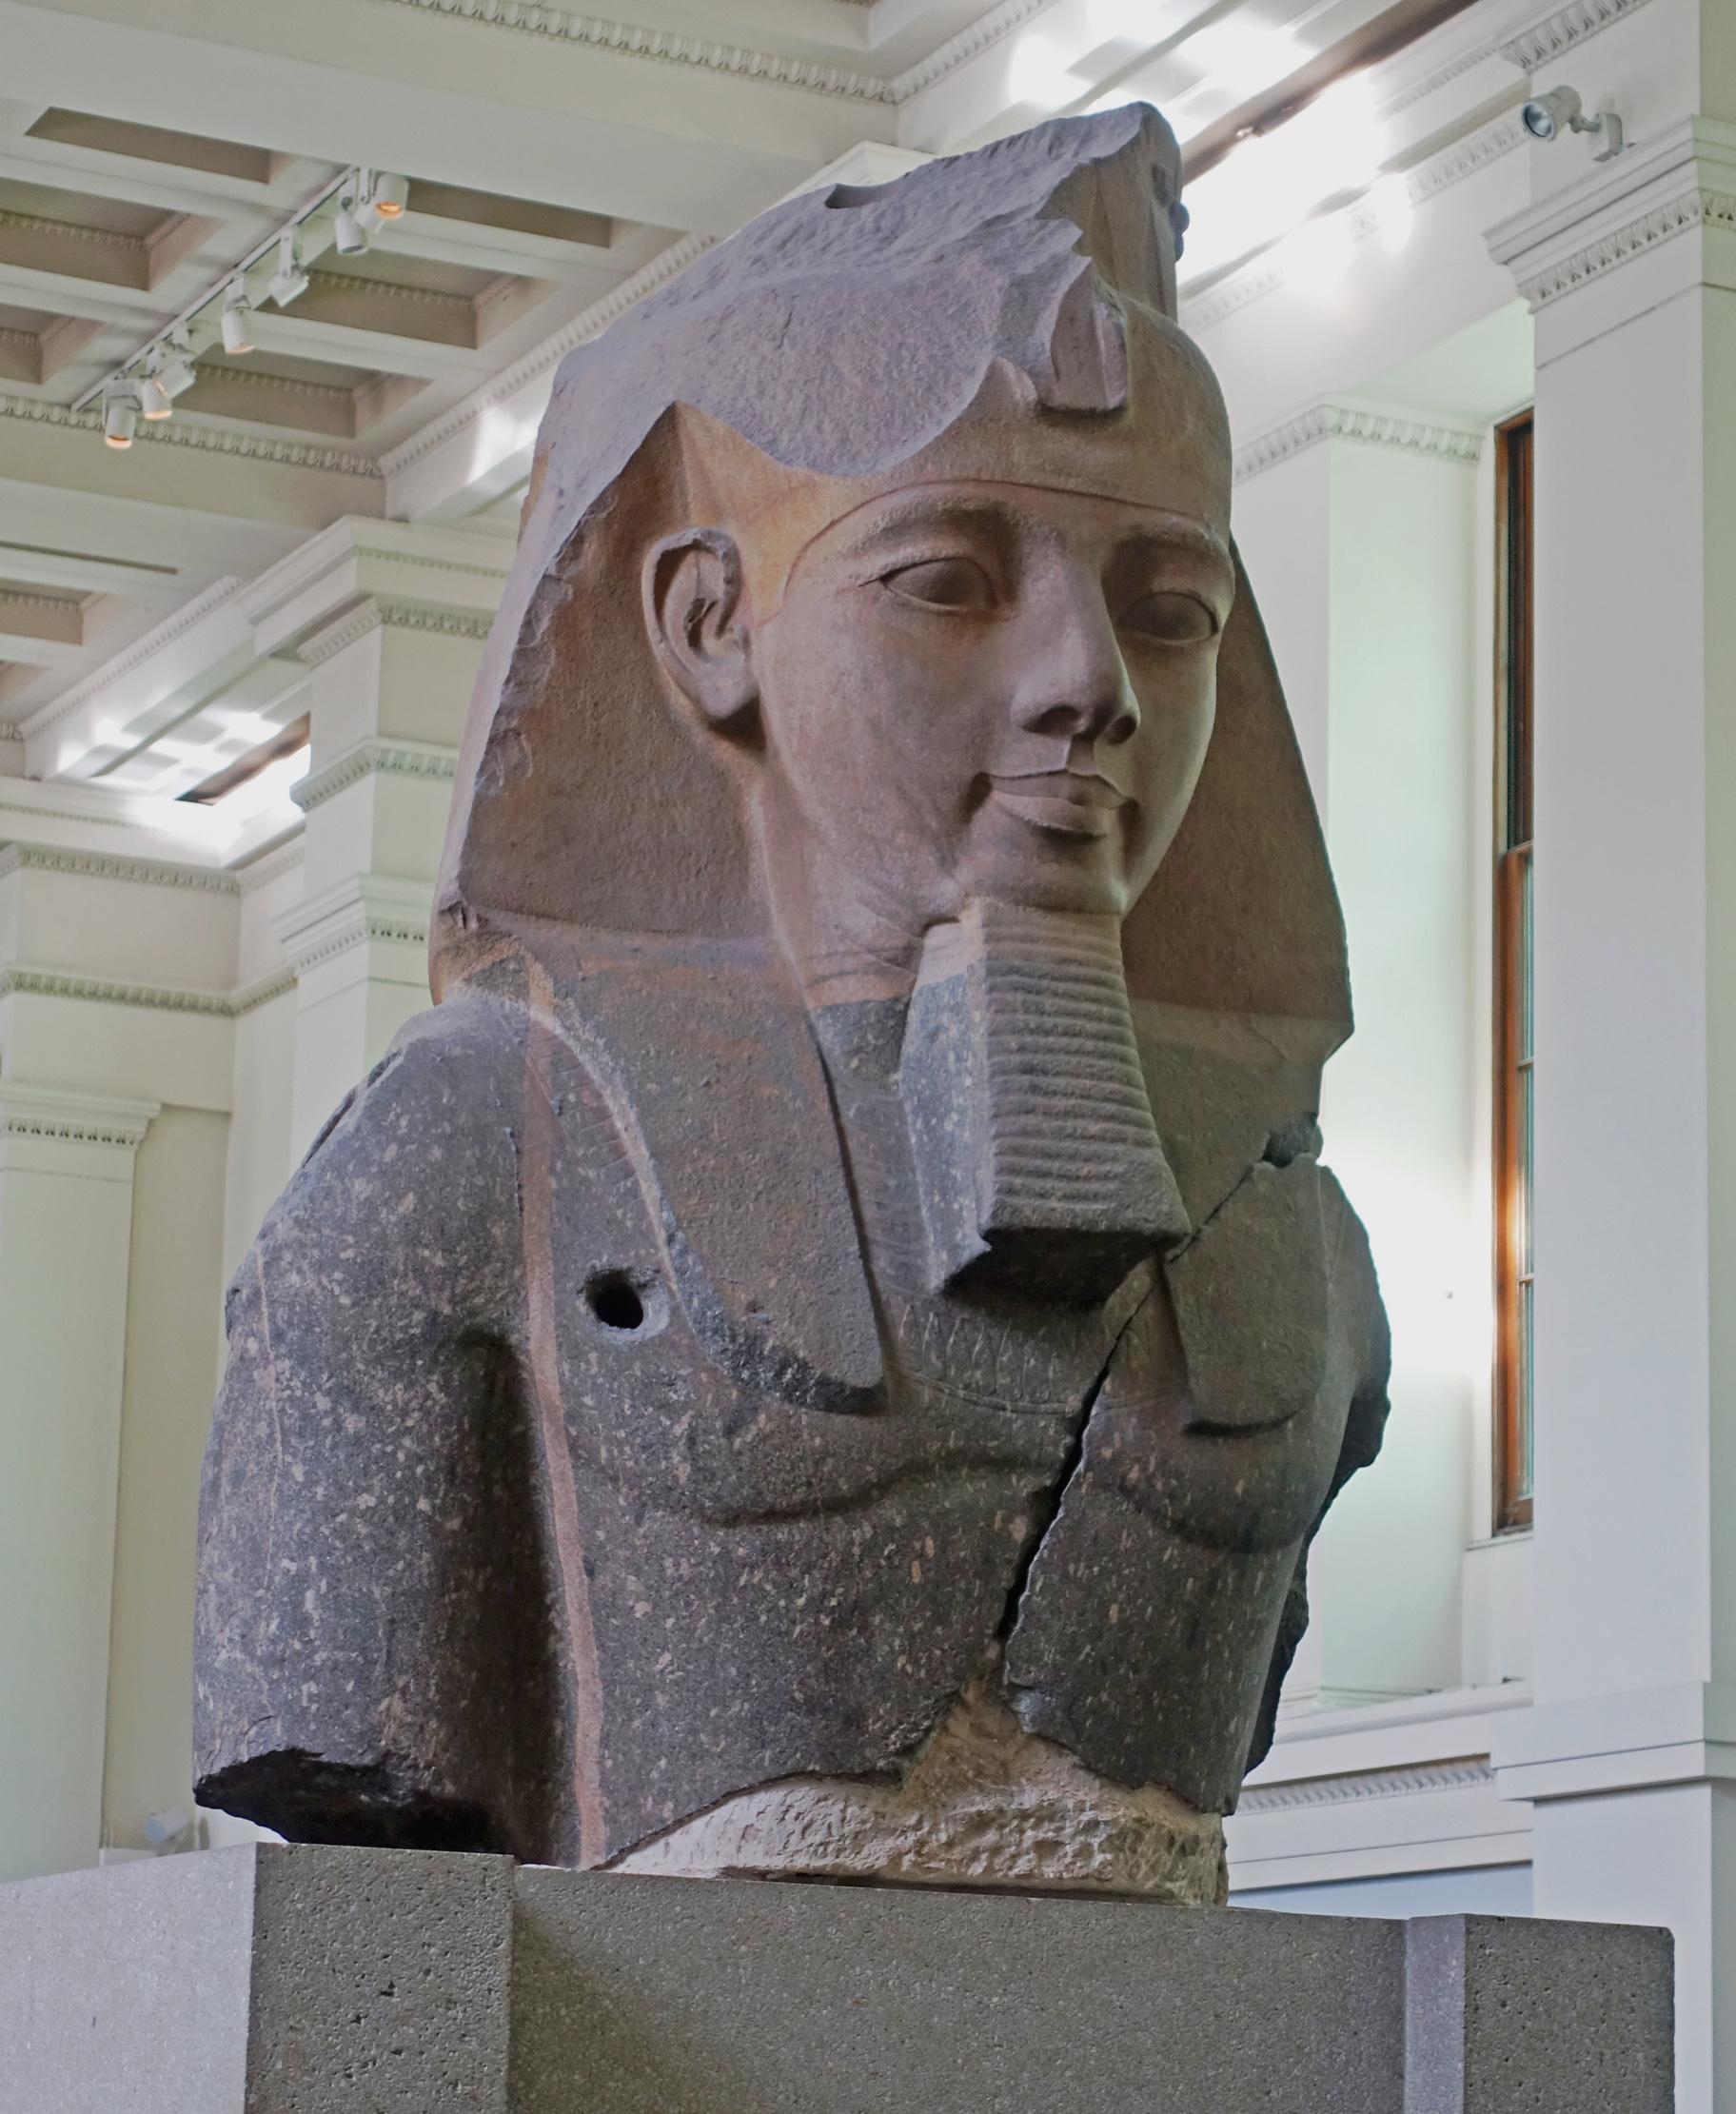 Rameses Iibarbarism And Civilization